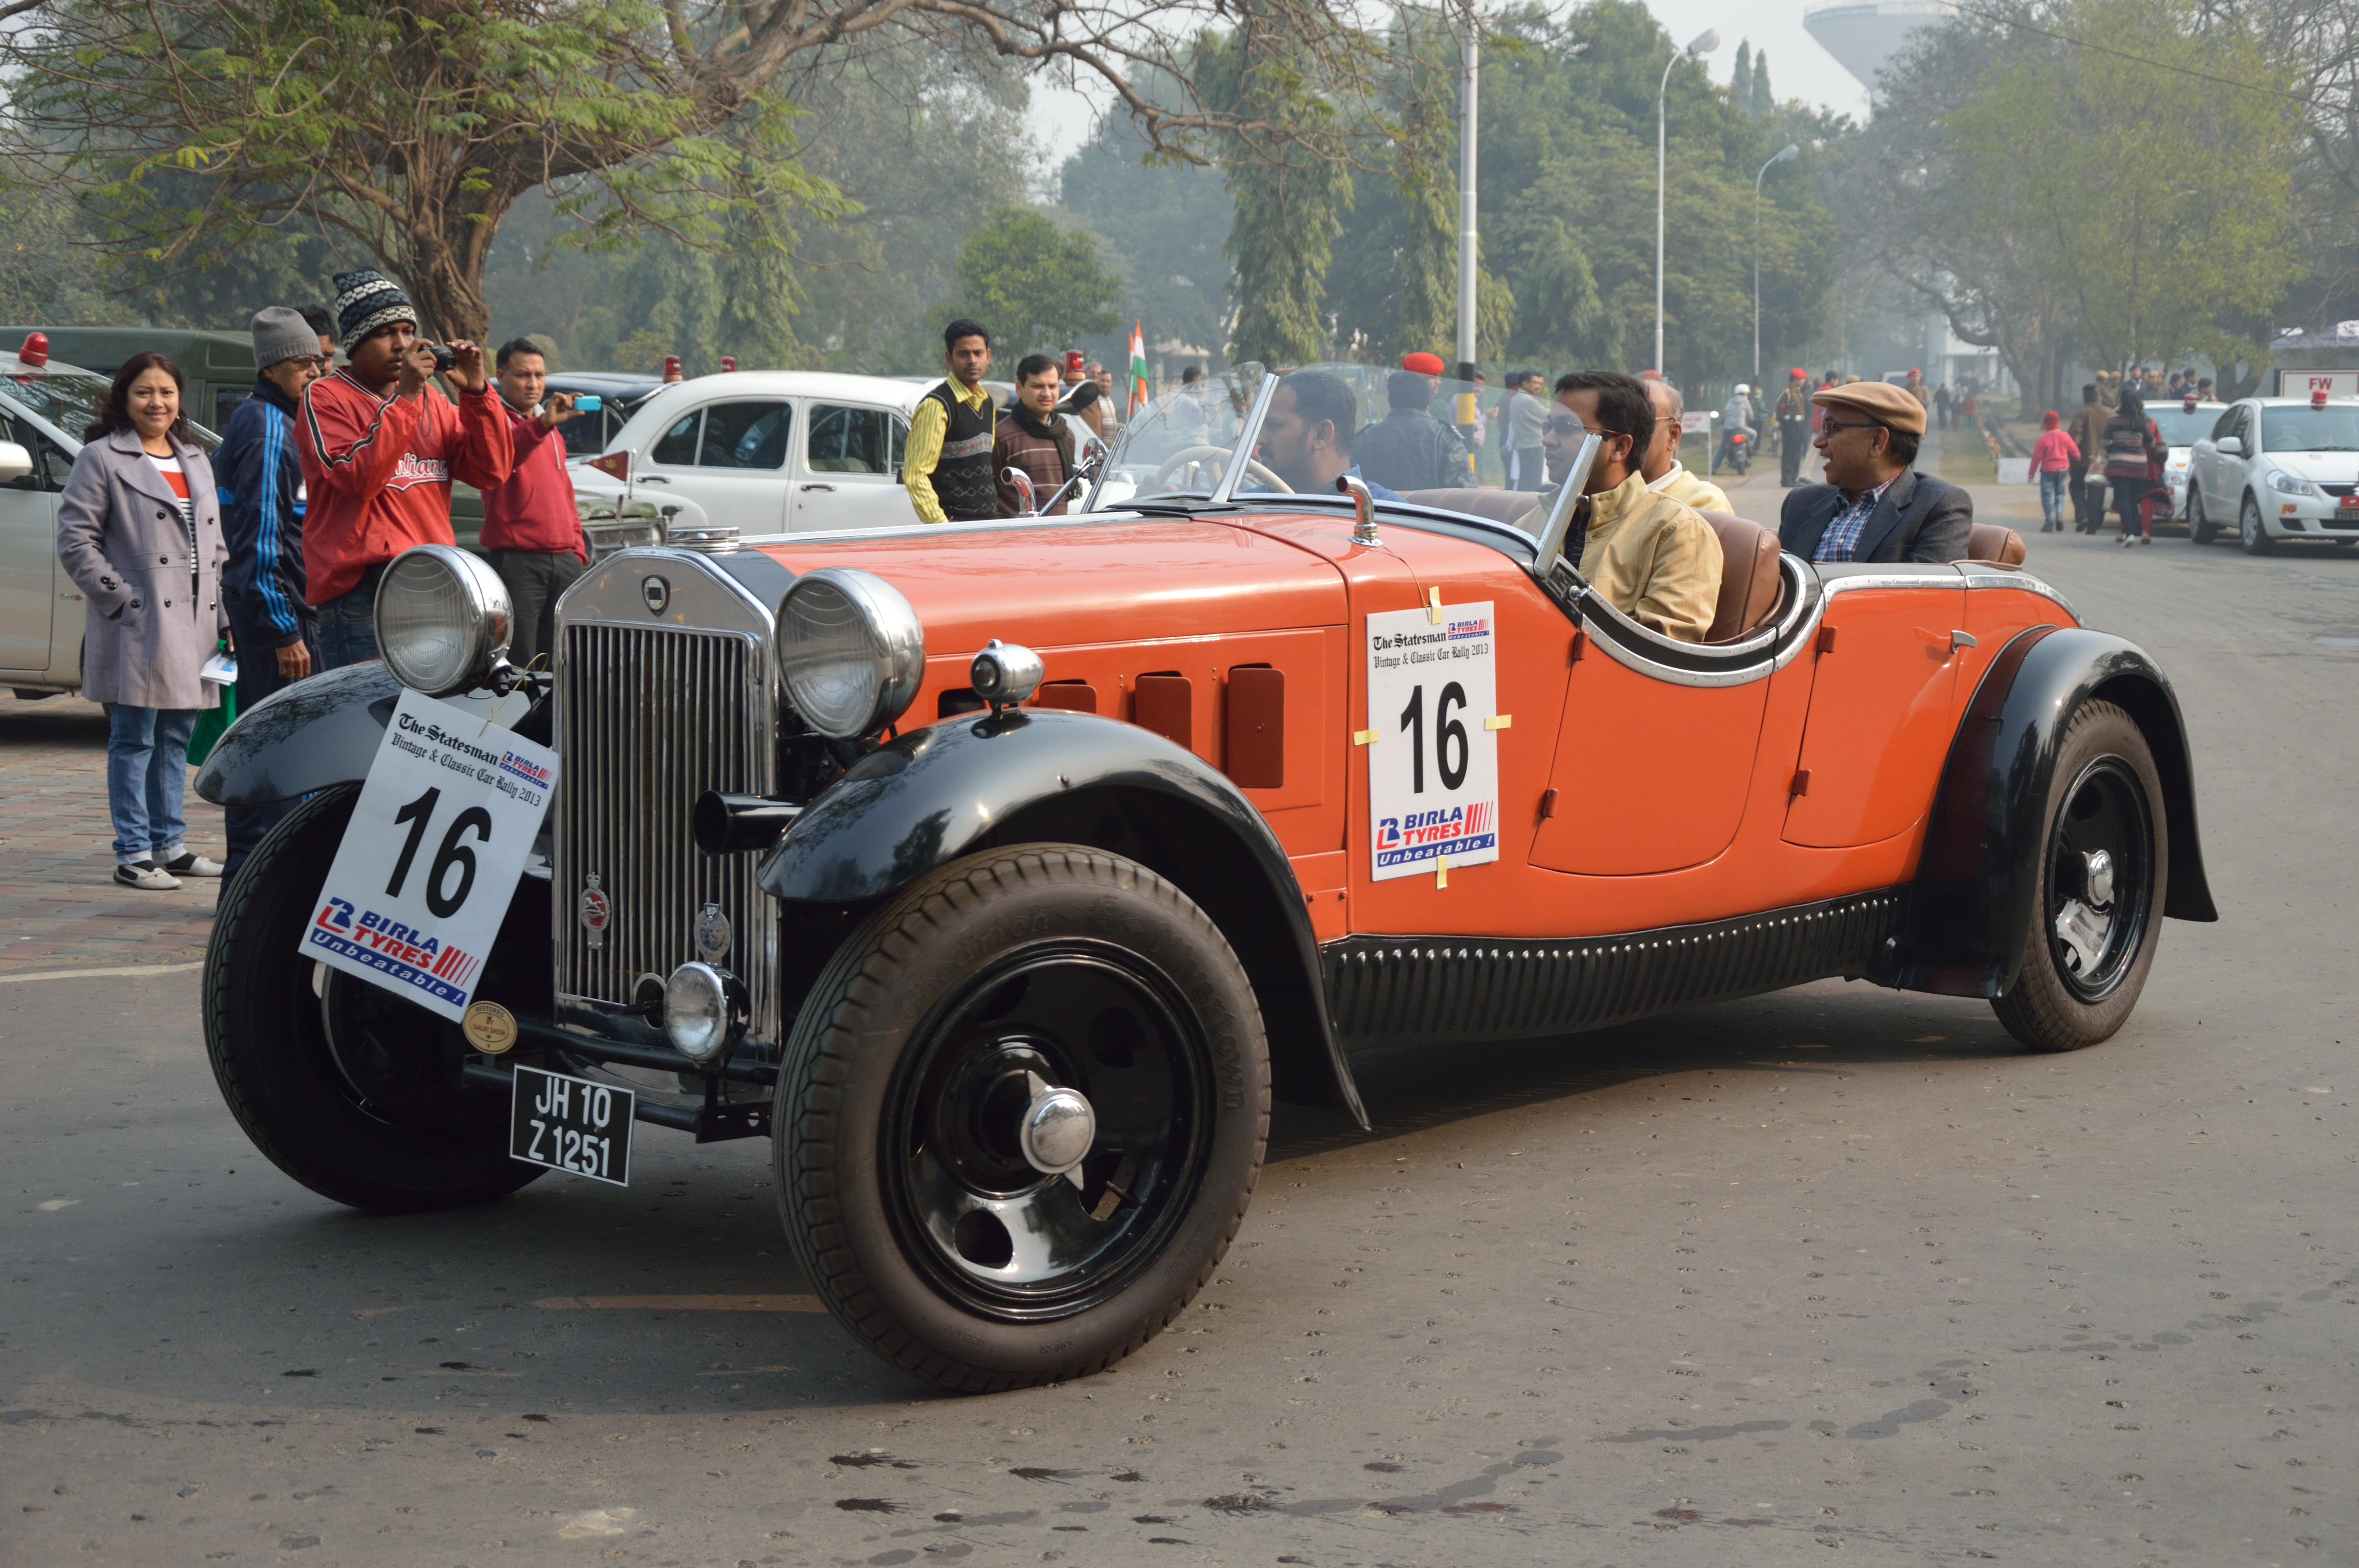 http://upload.wikimedia.org/wikipedia/commons/4/40/Lancia_-_Dilambda_-_1926_-_30_hp_-_8_cyl_-_Kolkata_2013-01-13_3220.JPG